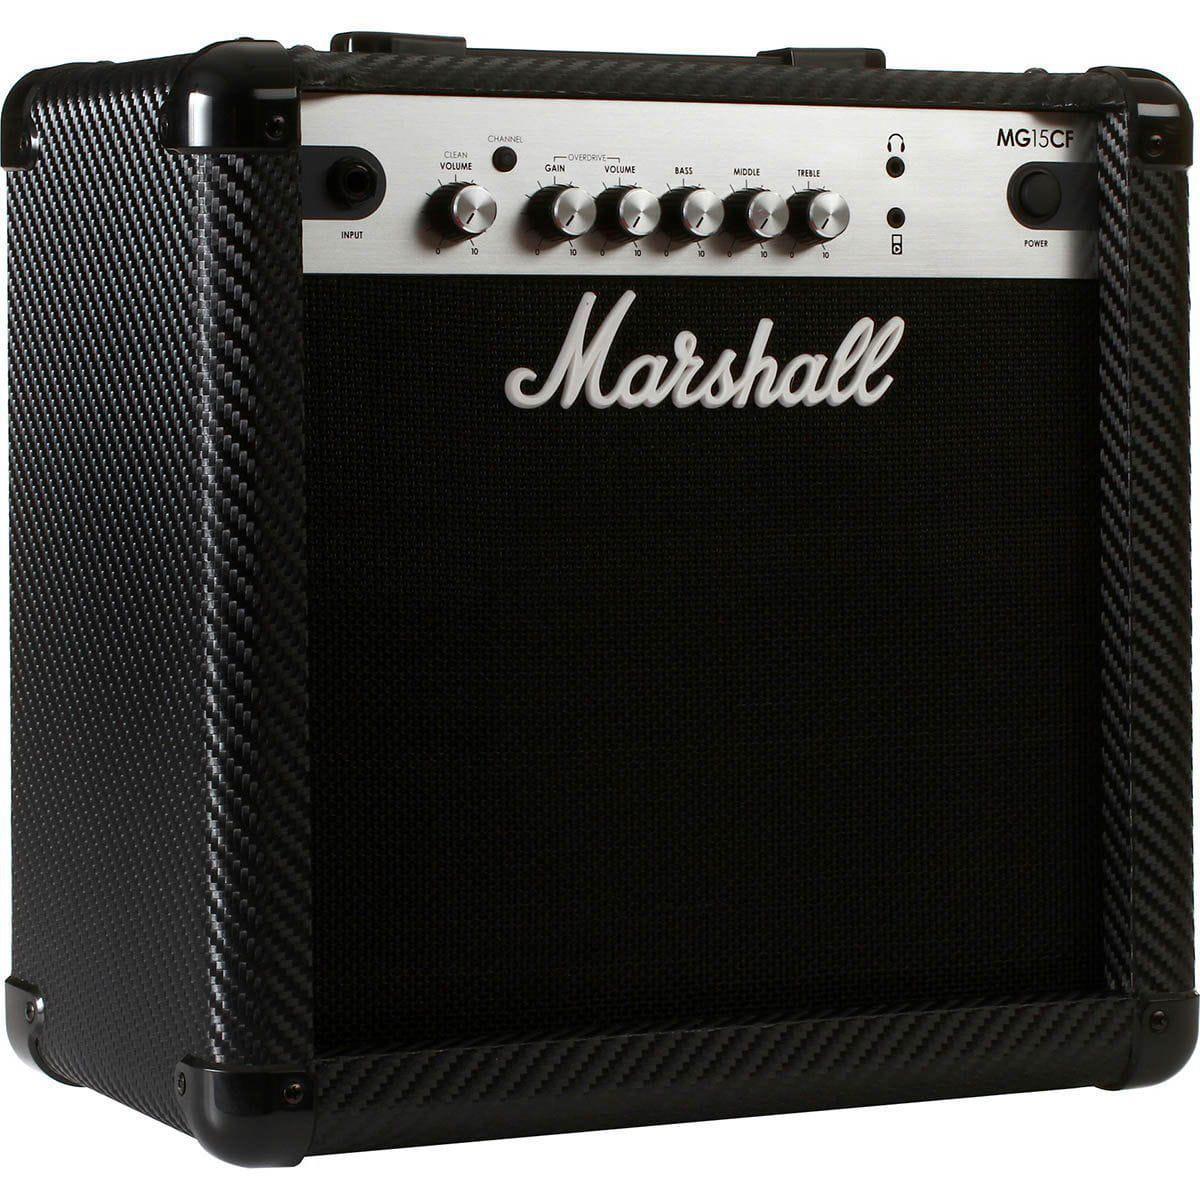 Marshall Amplificador Cubo para Guitarra MG15CF (8''/15w RMS)